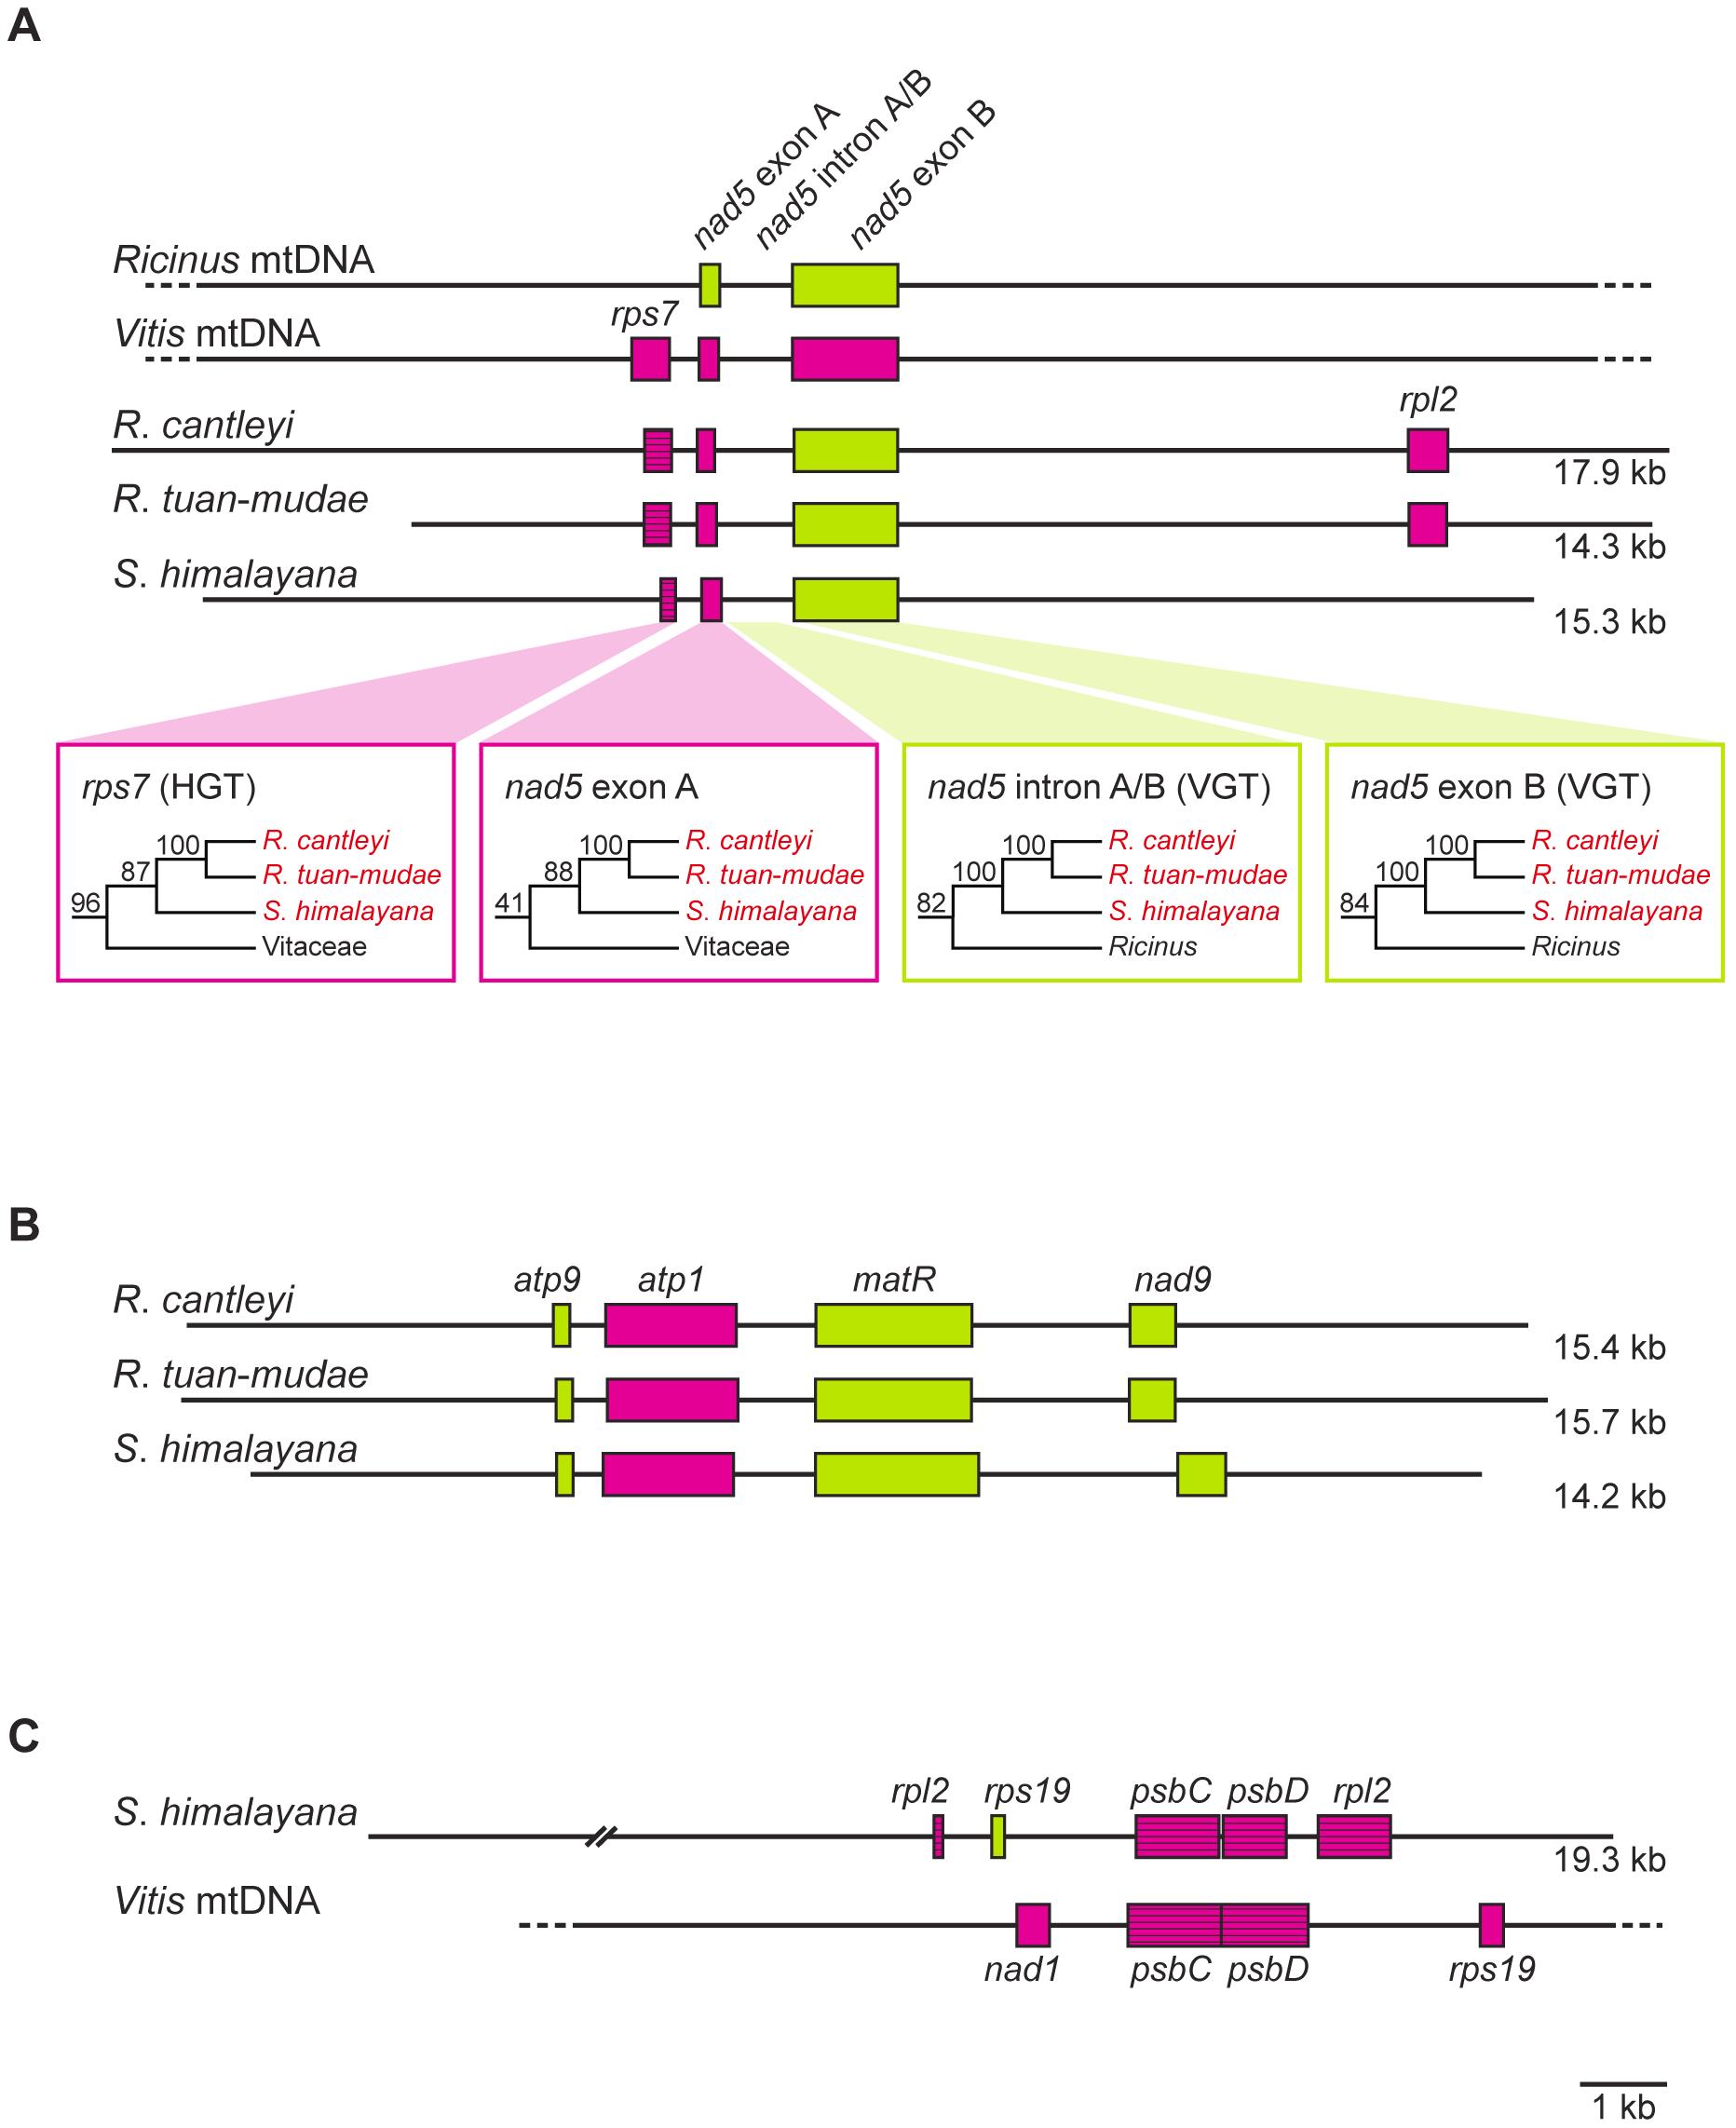 Gene organization of three assembled contigs for Rafflesiaceae (<i>Rafflesia cantleyi</i>, <i>Rafflesia tuan-mudae</i>, and <i>Sapria himalayana</i>), <i>Ricinus communis</i> (Euphorbiaceae), and <i>Vitis vinifera</i> (Vitaceae).